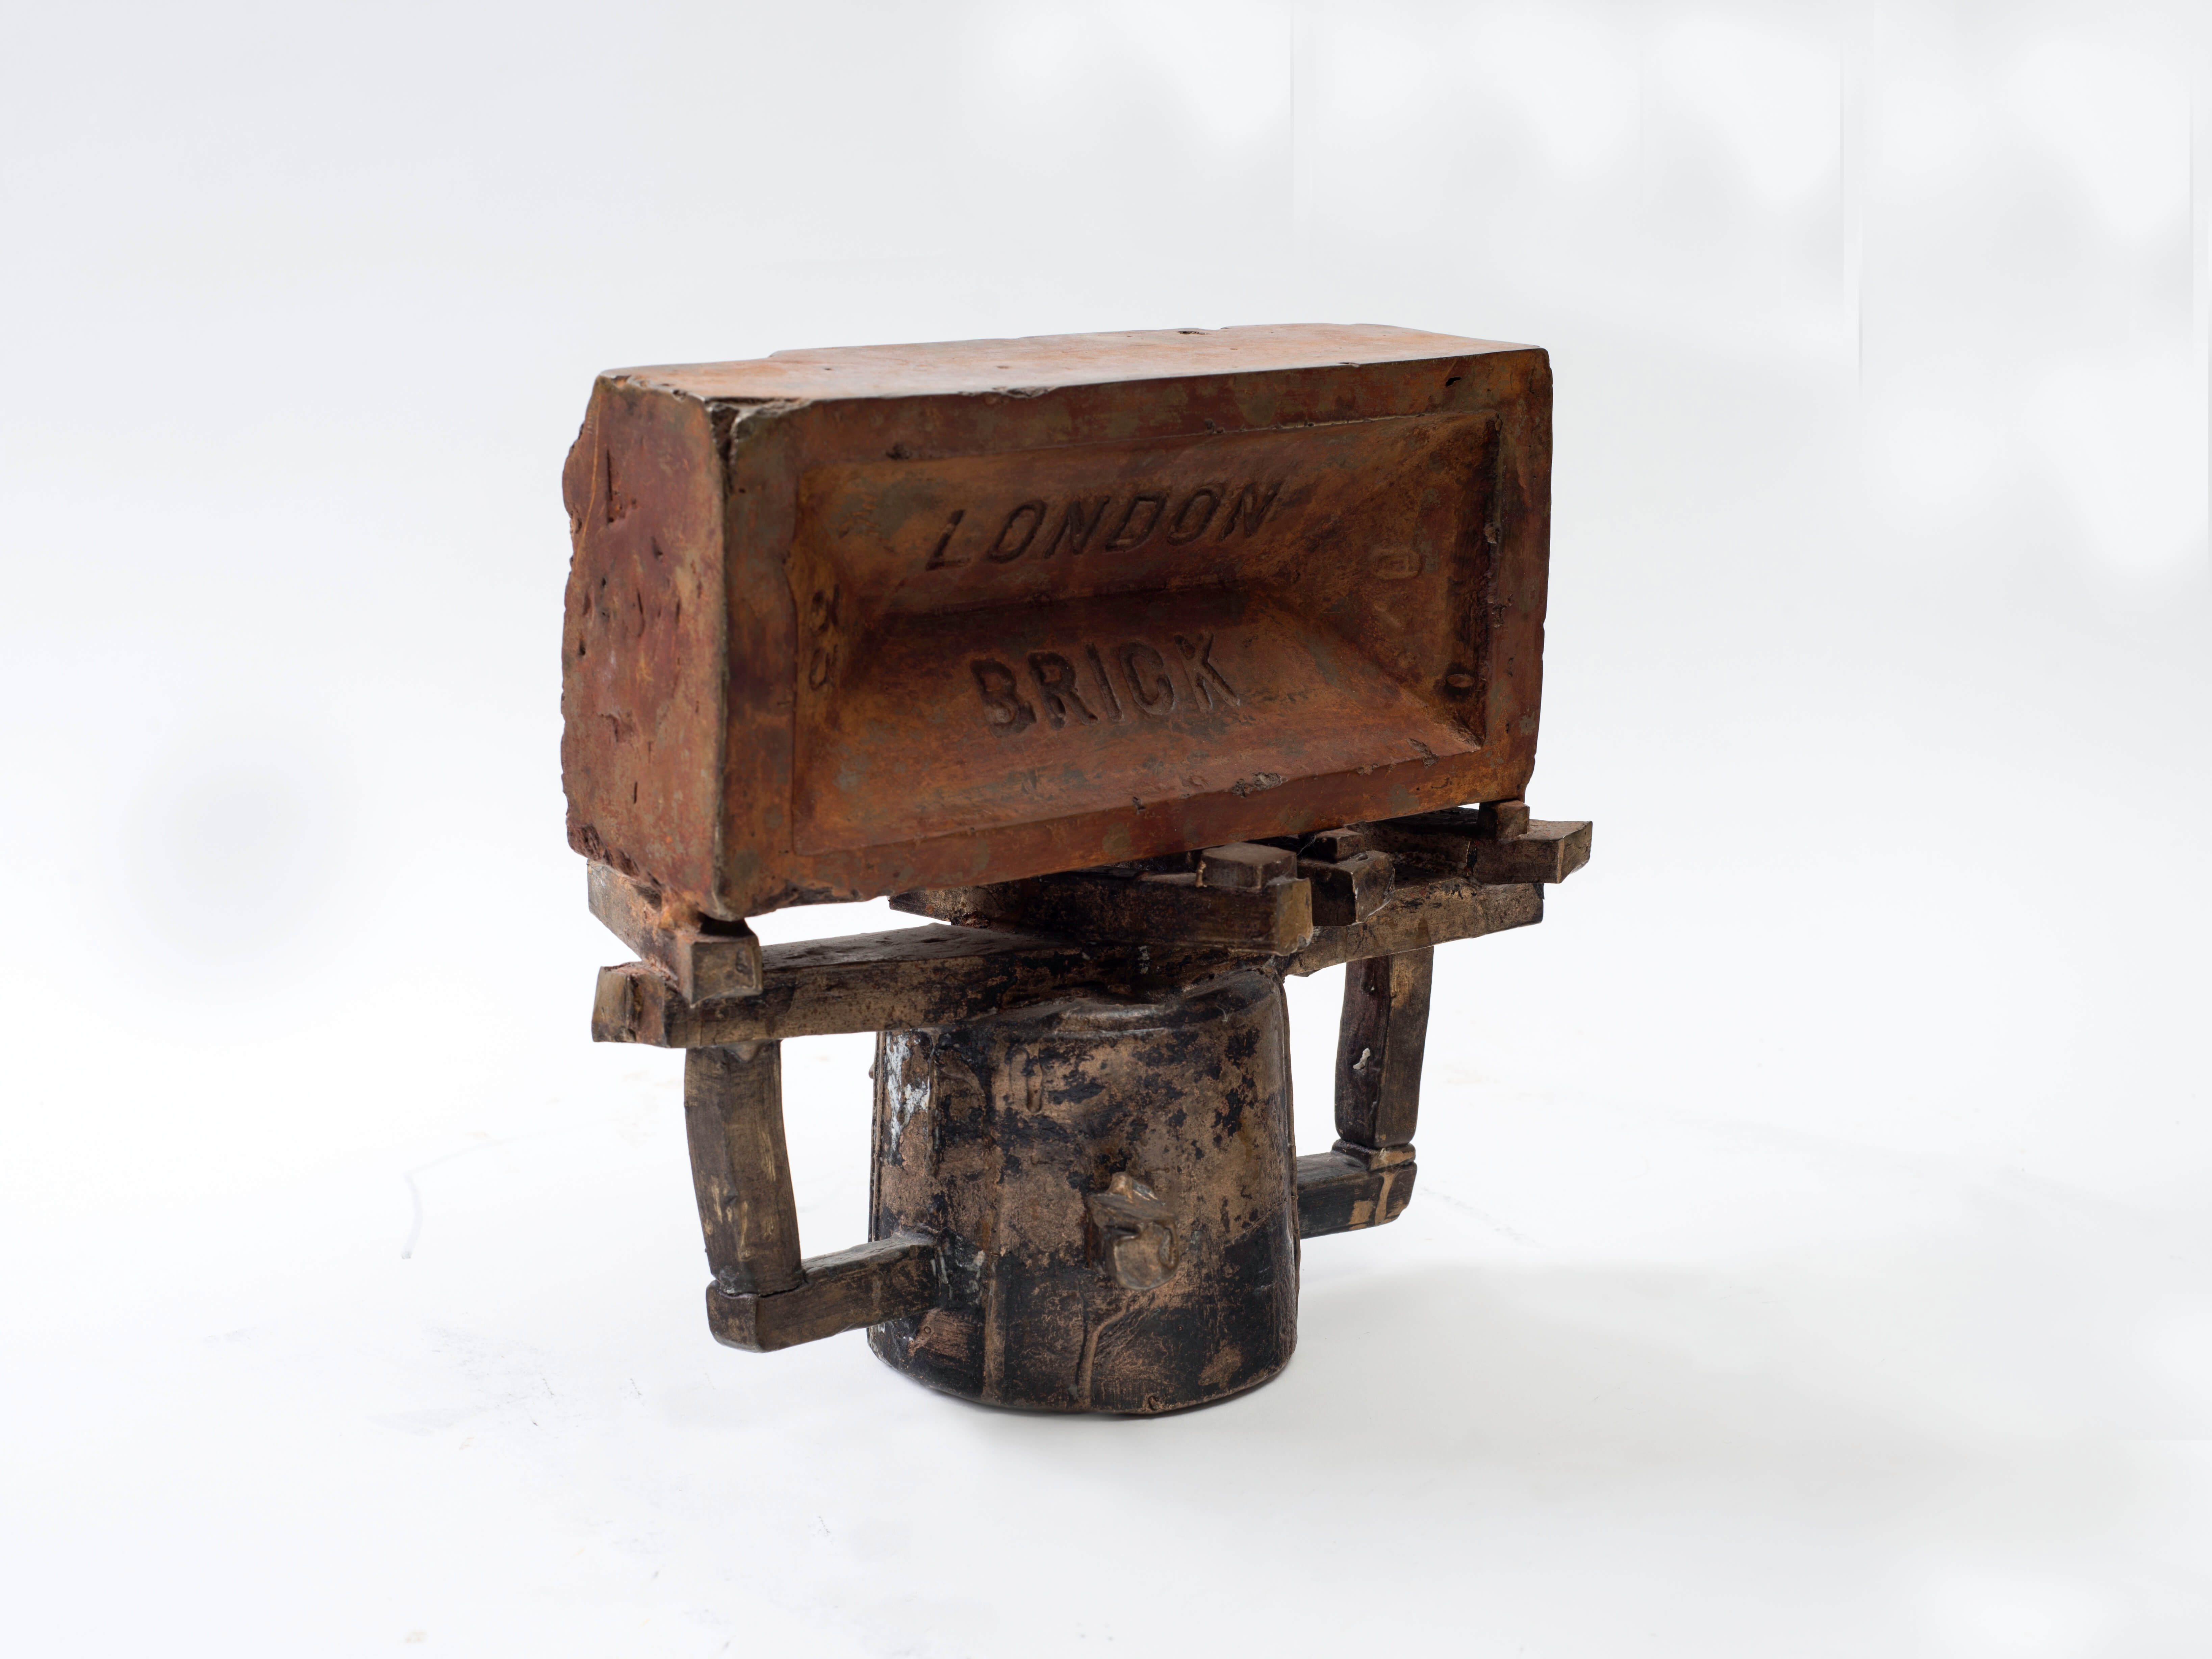 1228_Drora Dominey, London Brick, 2015, Bronze, iron, concrete and building debris, 20x20x10 cm-6549x4912